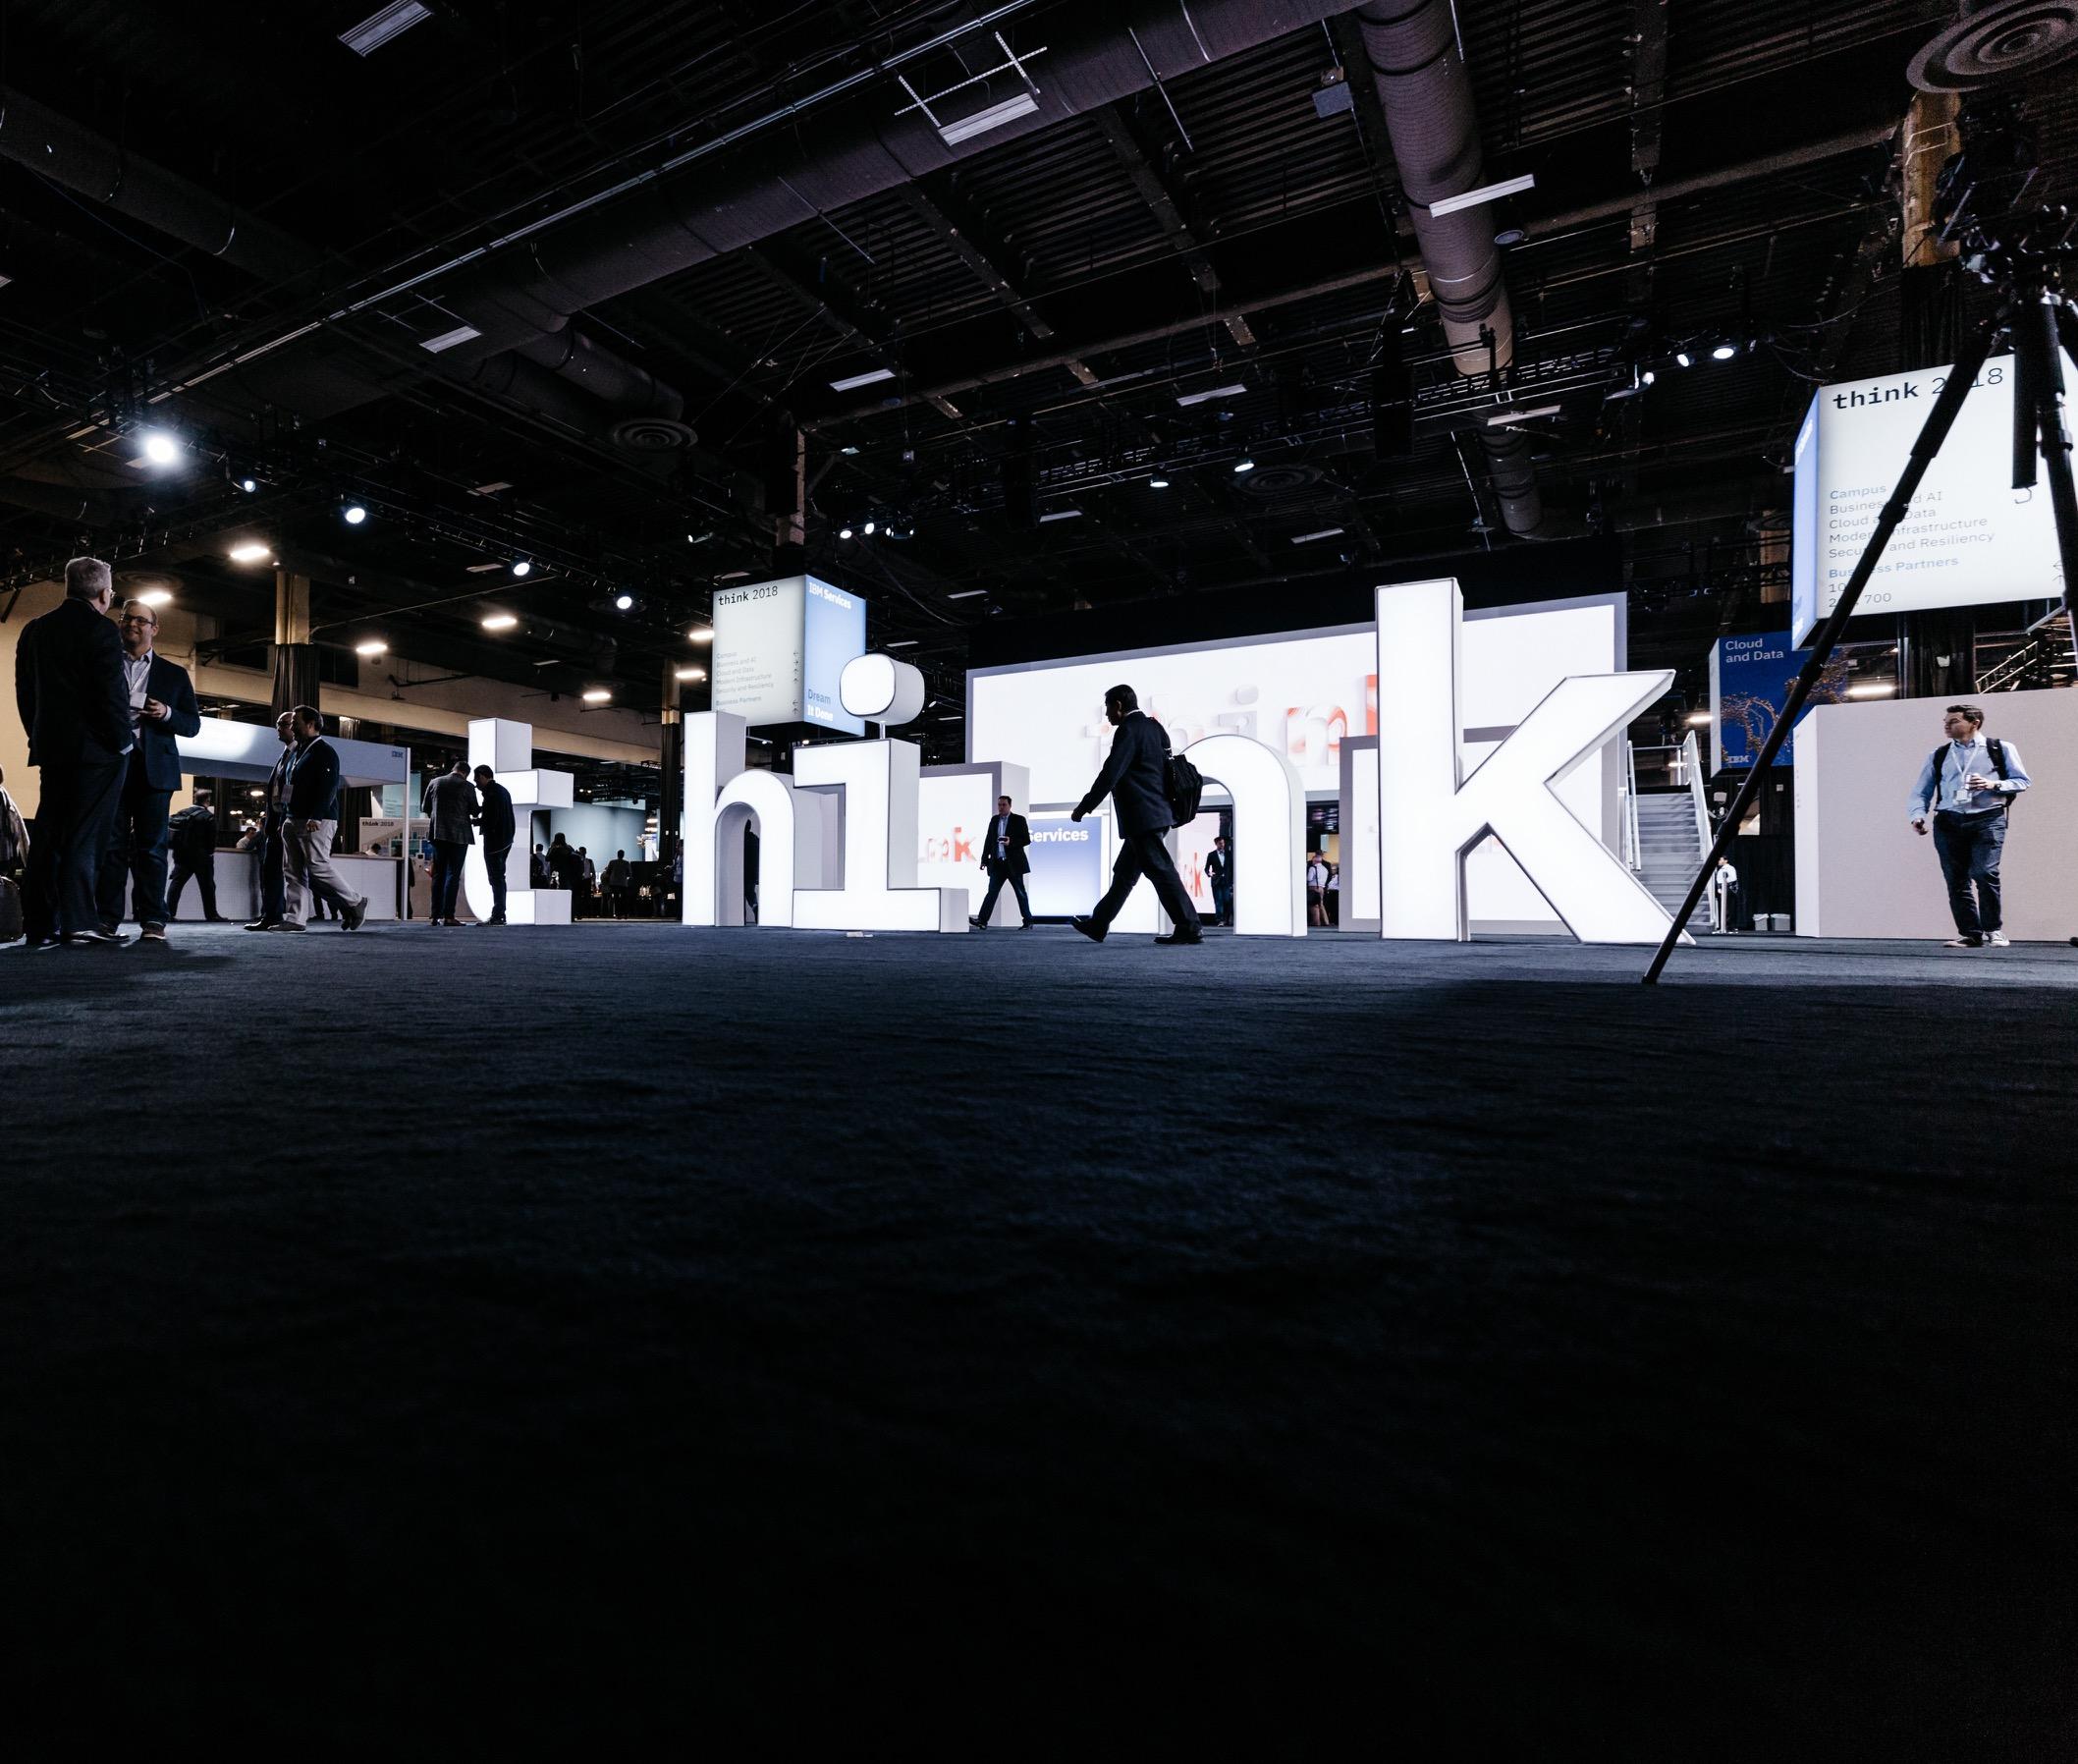 PaulTellefsen-IBMThink2018-47.jpg